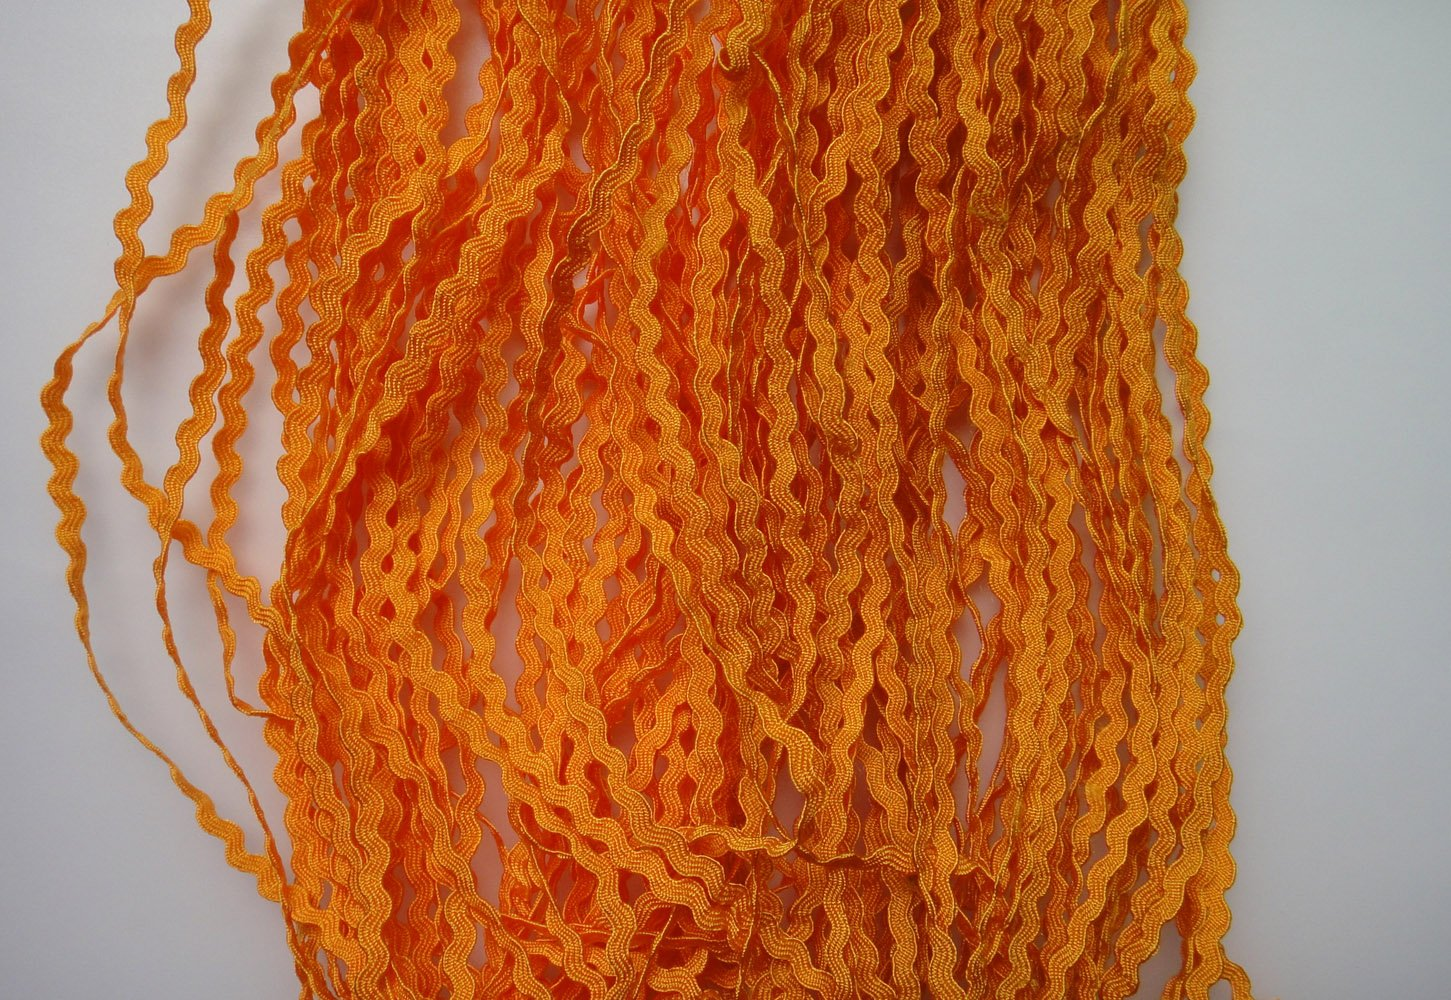 Lyracces Wholesale Lots 50yards Mini Woven Zigzag Rick Rack Ribbon Ric Rac Trims Scrapbooking Dressmaking 3mm, Yellow